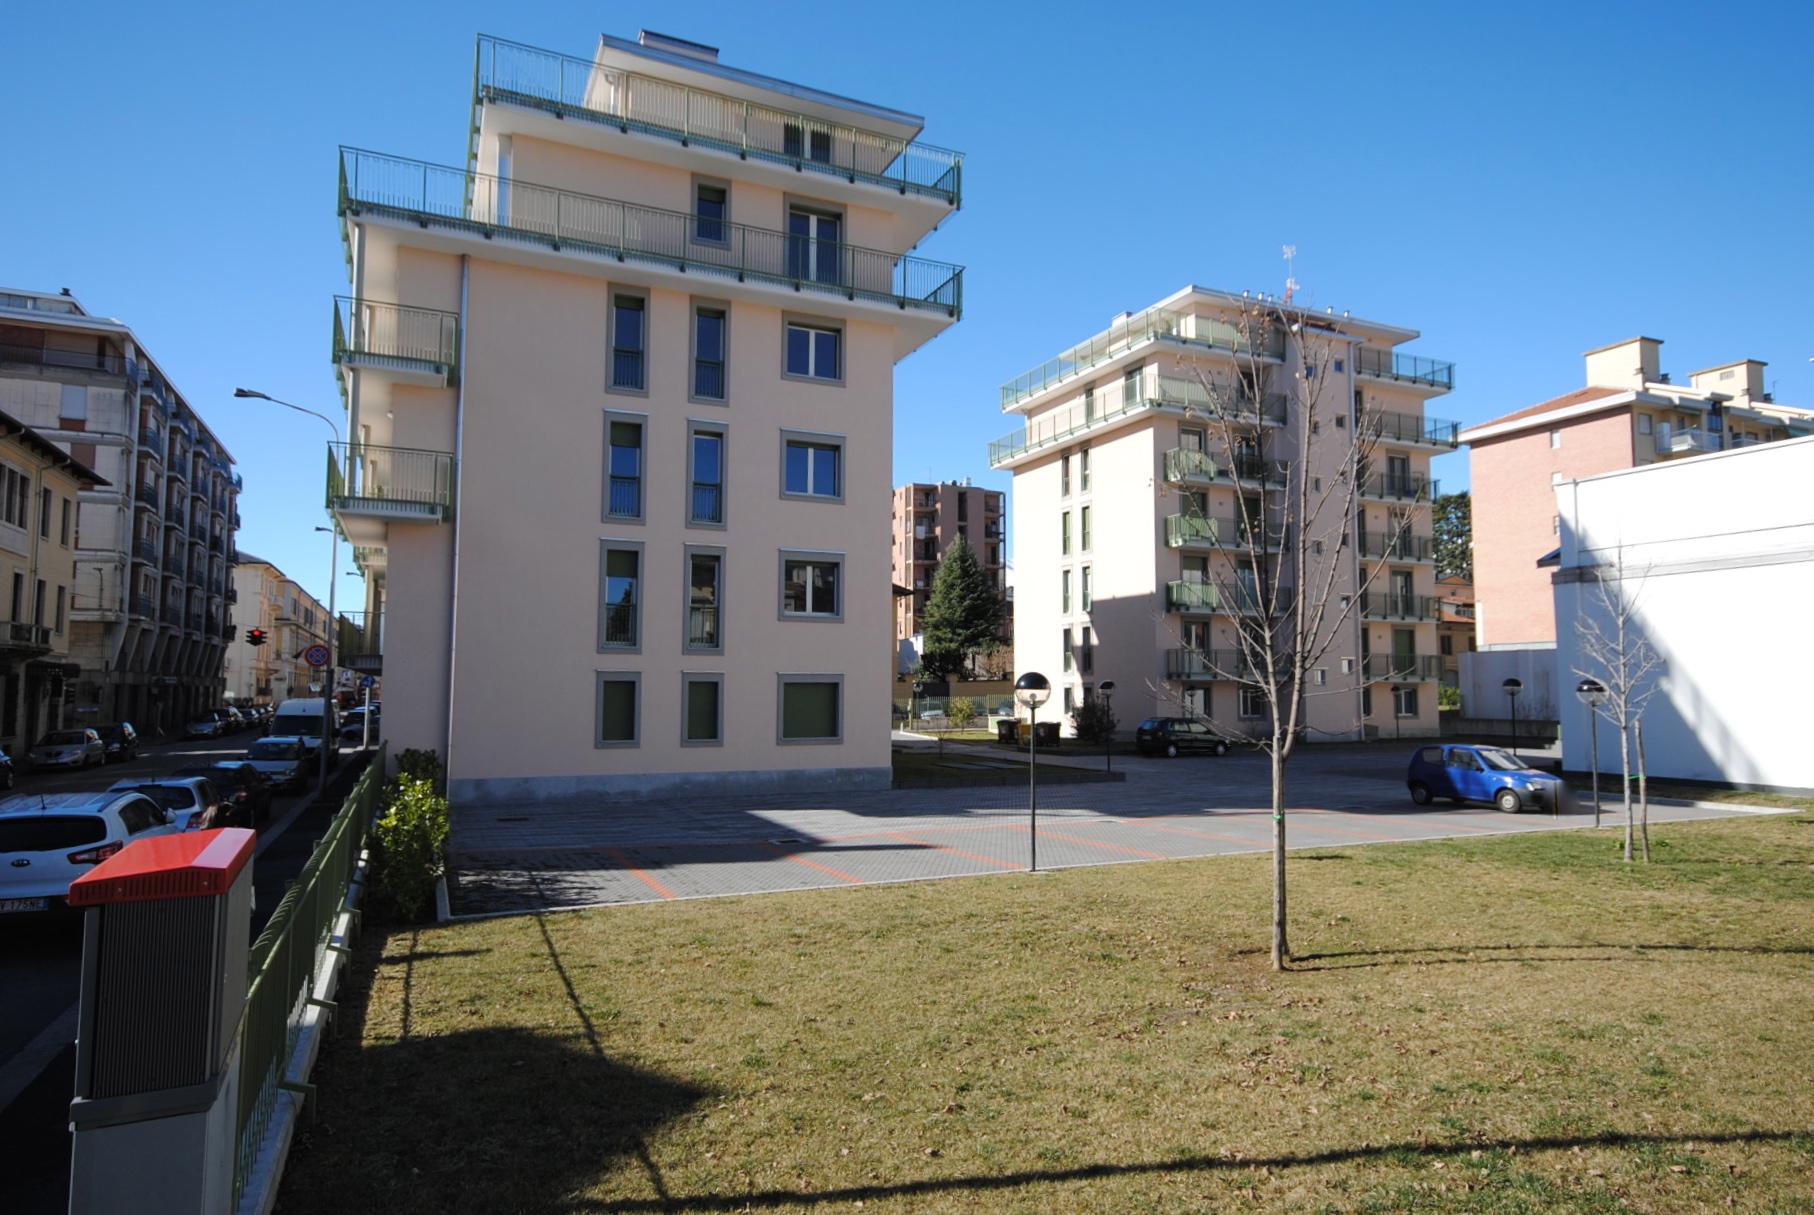 Biella Residenza l' Arca Appartamenti e Uffici in Vendita